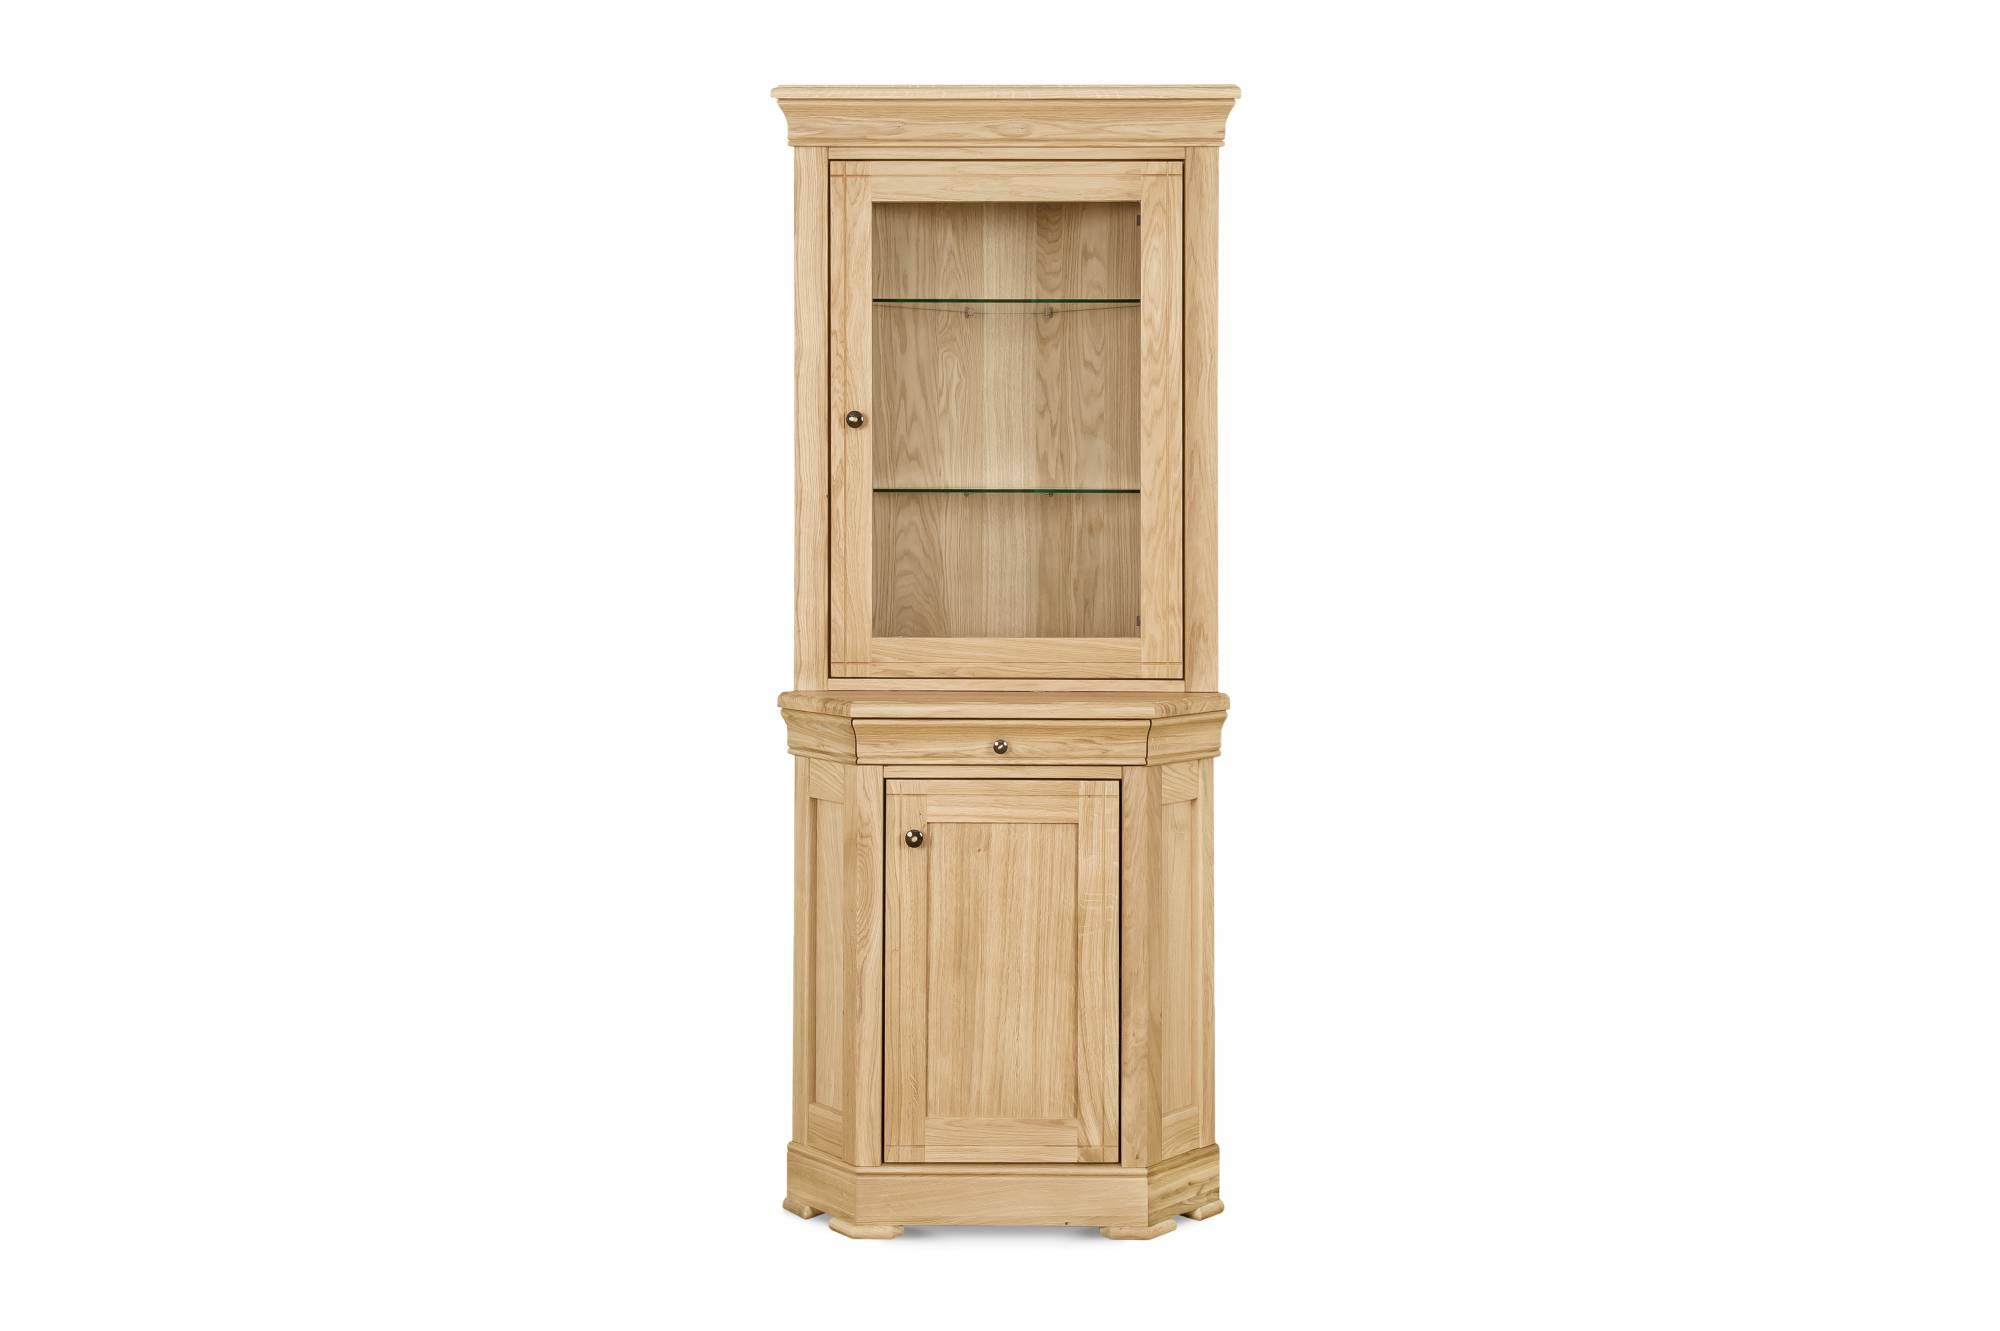 Favorite Oil Pale Finish 4 Door Sideboards With Moreno Oak Corner Display Cabinetclemence Richards At Lukehurst (View 20 of 20)